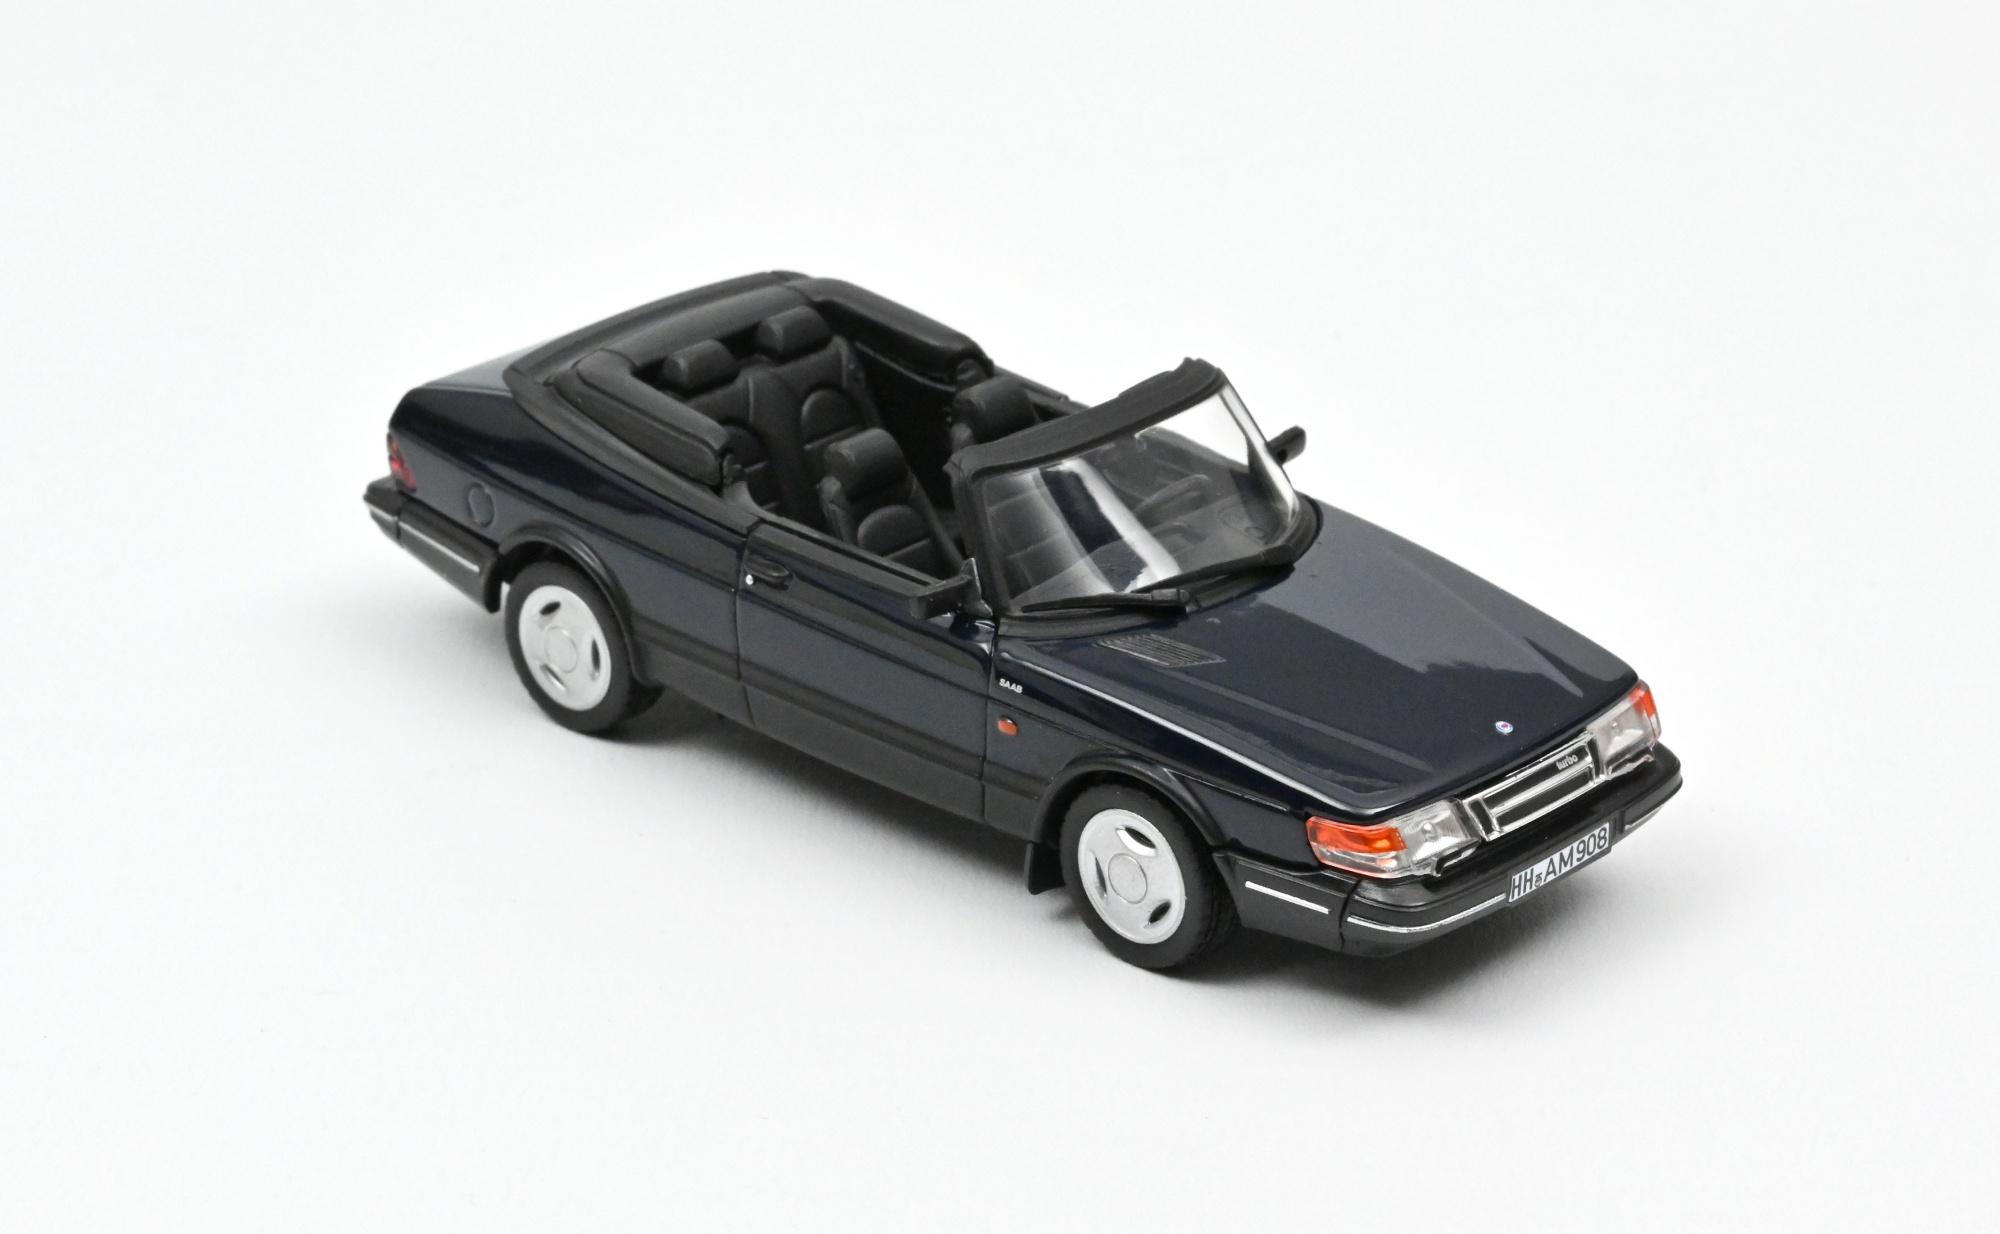 Saab 900 Turbo Cabriolet 1992 Dark Blue